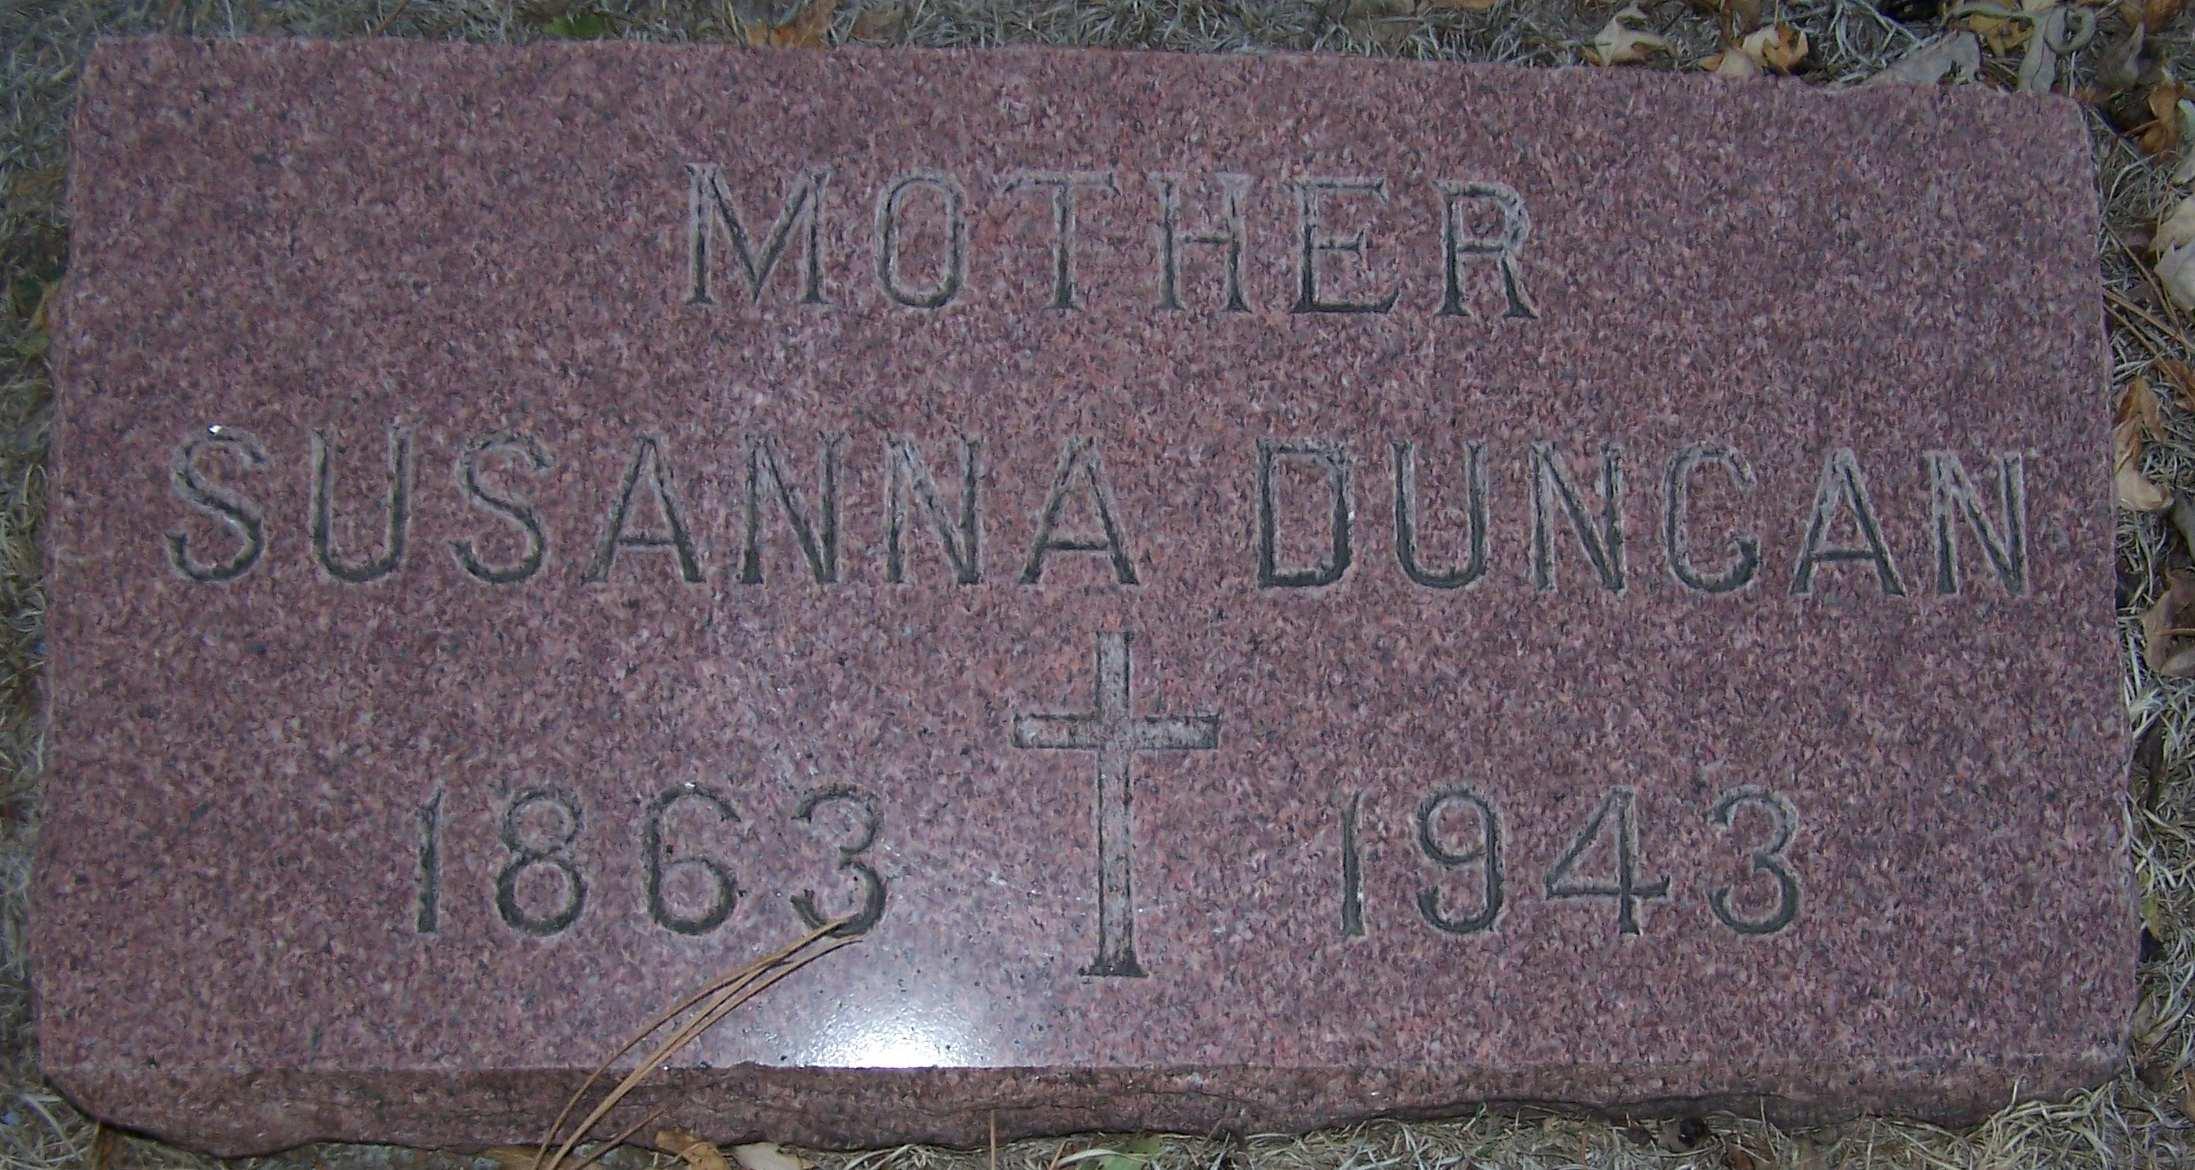 Susanna <i>Dougherty</i> Duncan